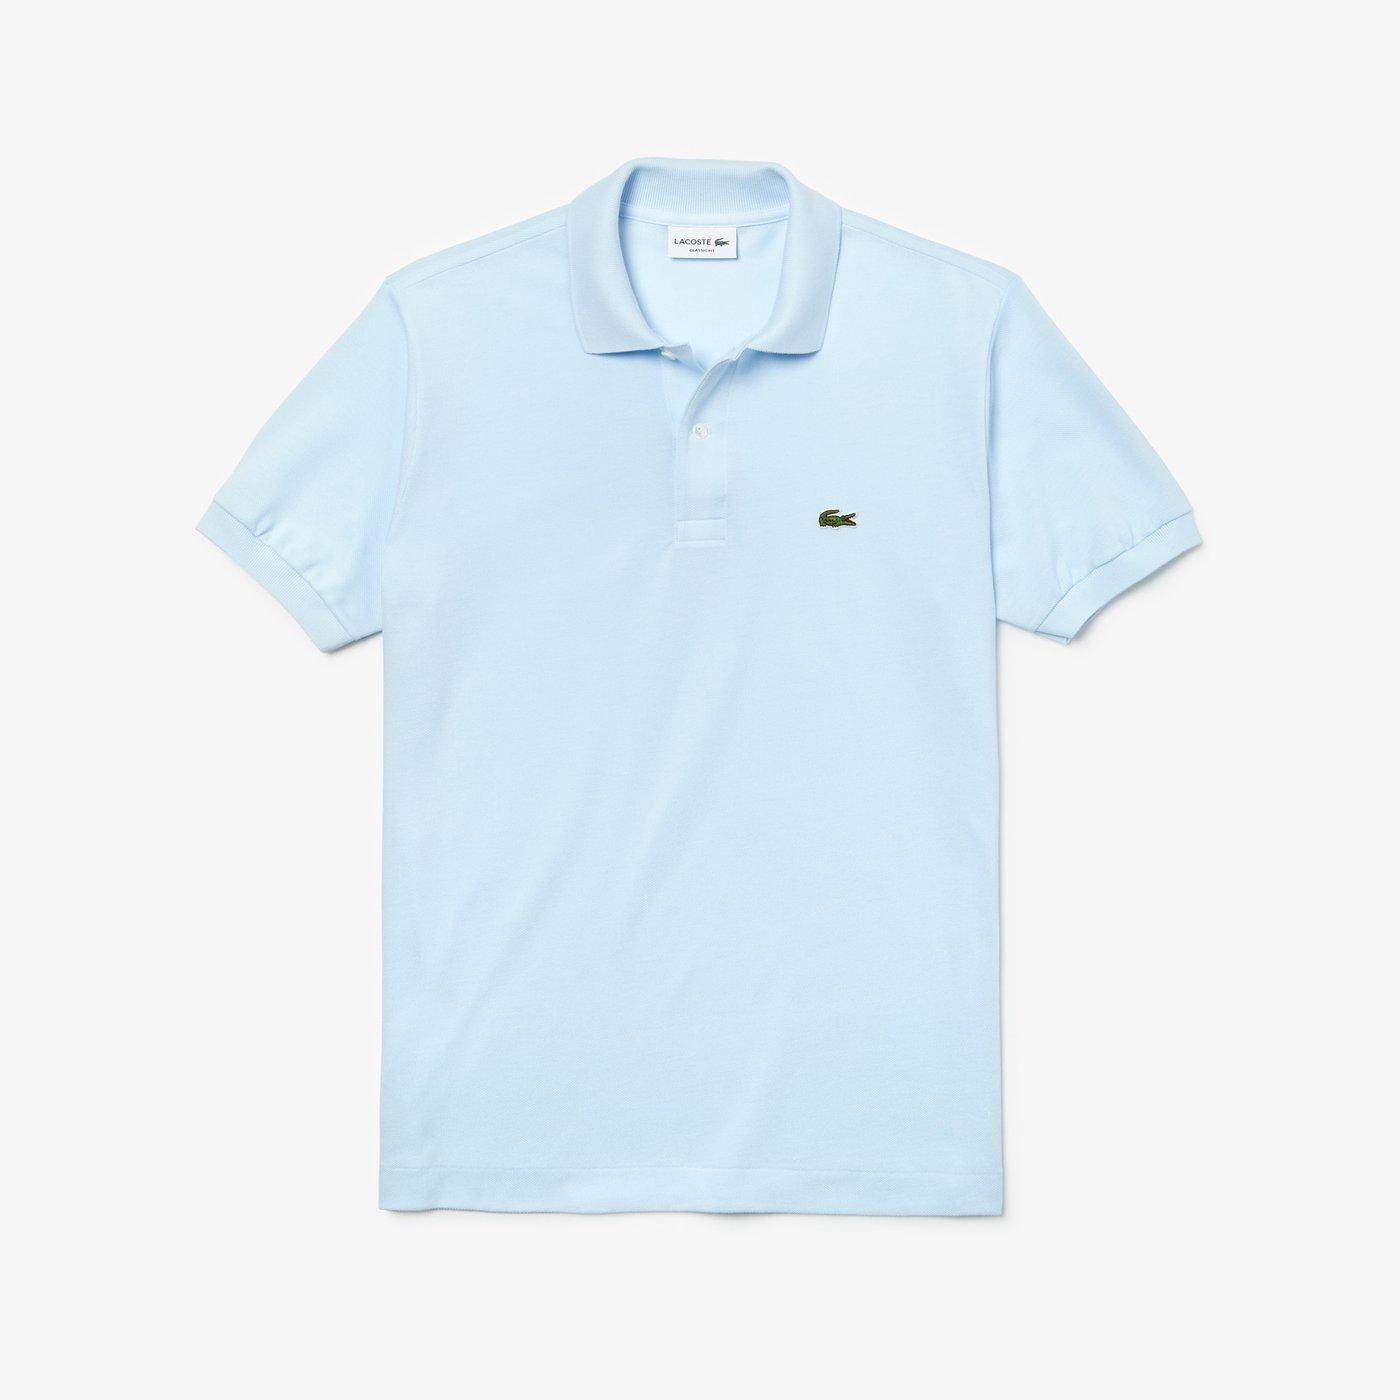 Lacoste L1212 Erkek Mavi Polo